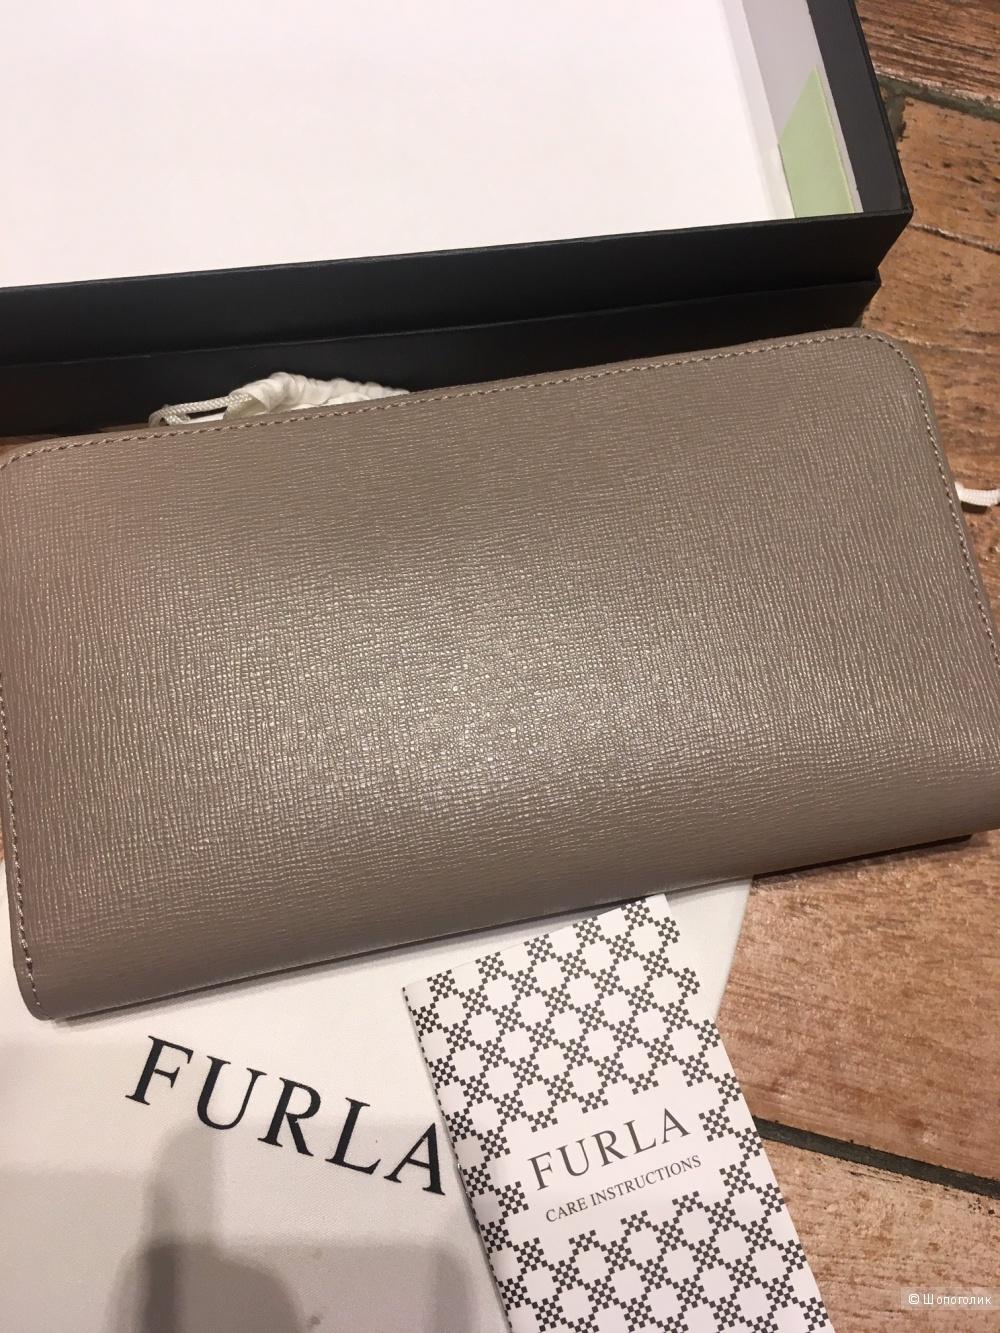 Кошелек Furla стандартный размер